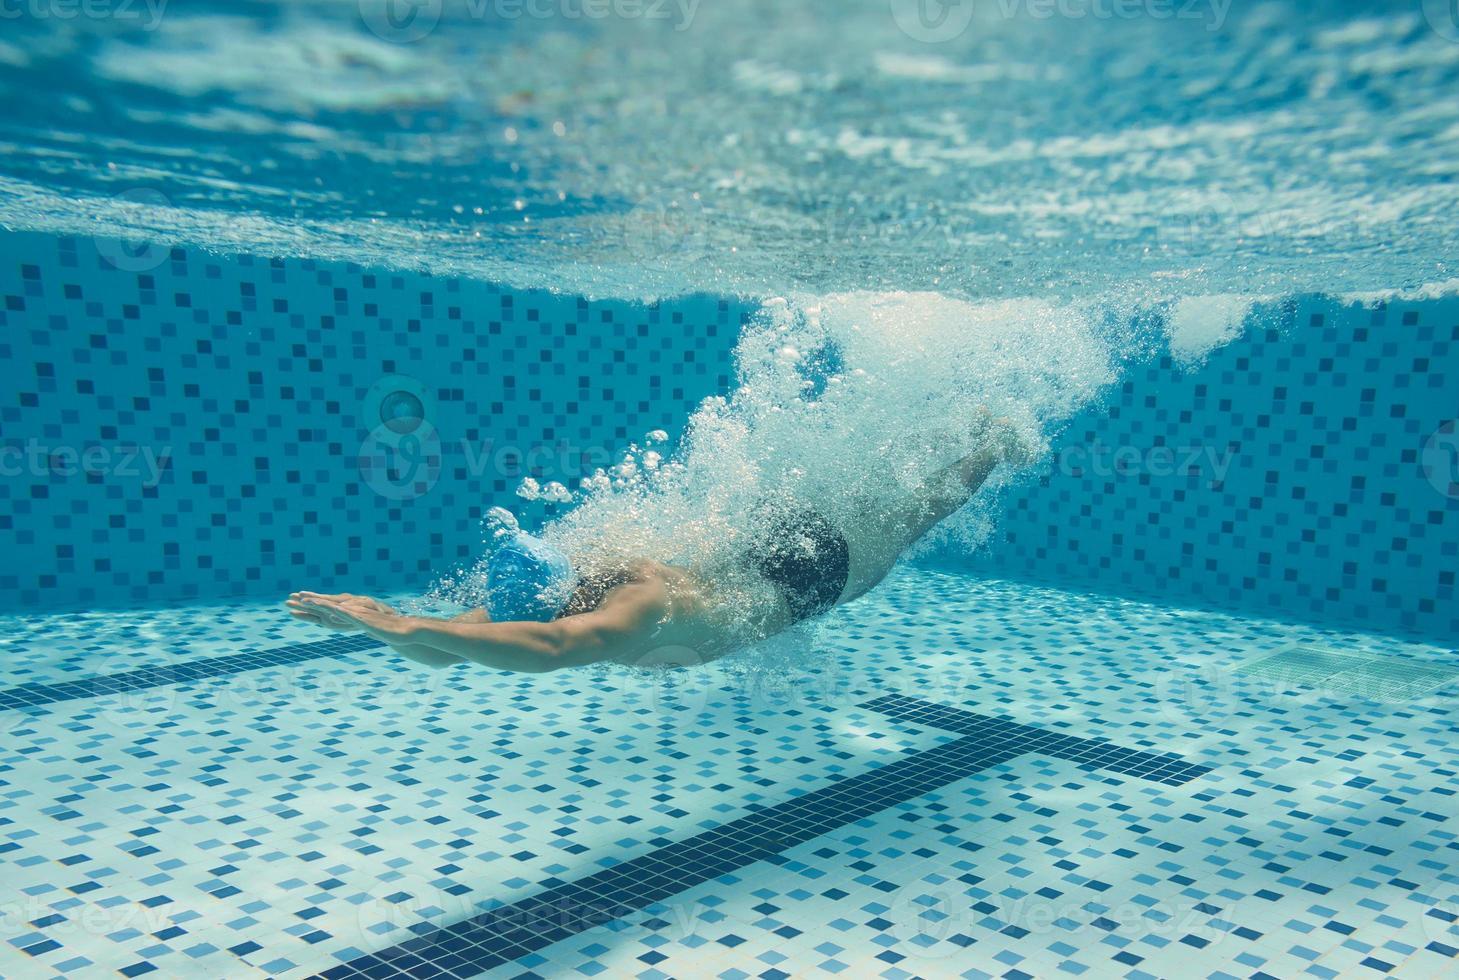 Tauchen im Pool foto